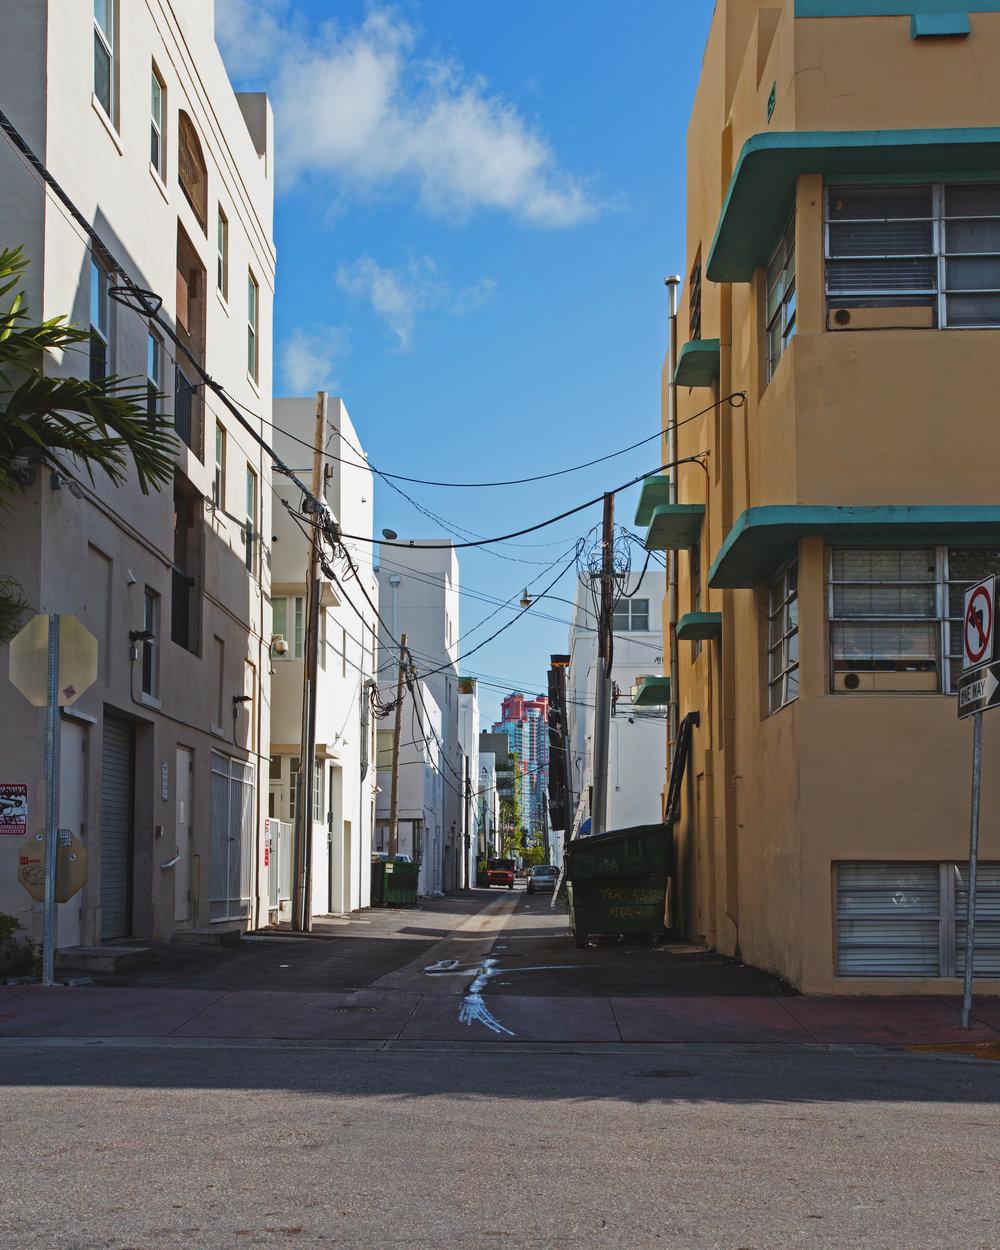 gta back streets3.jpg